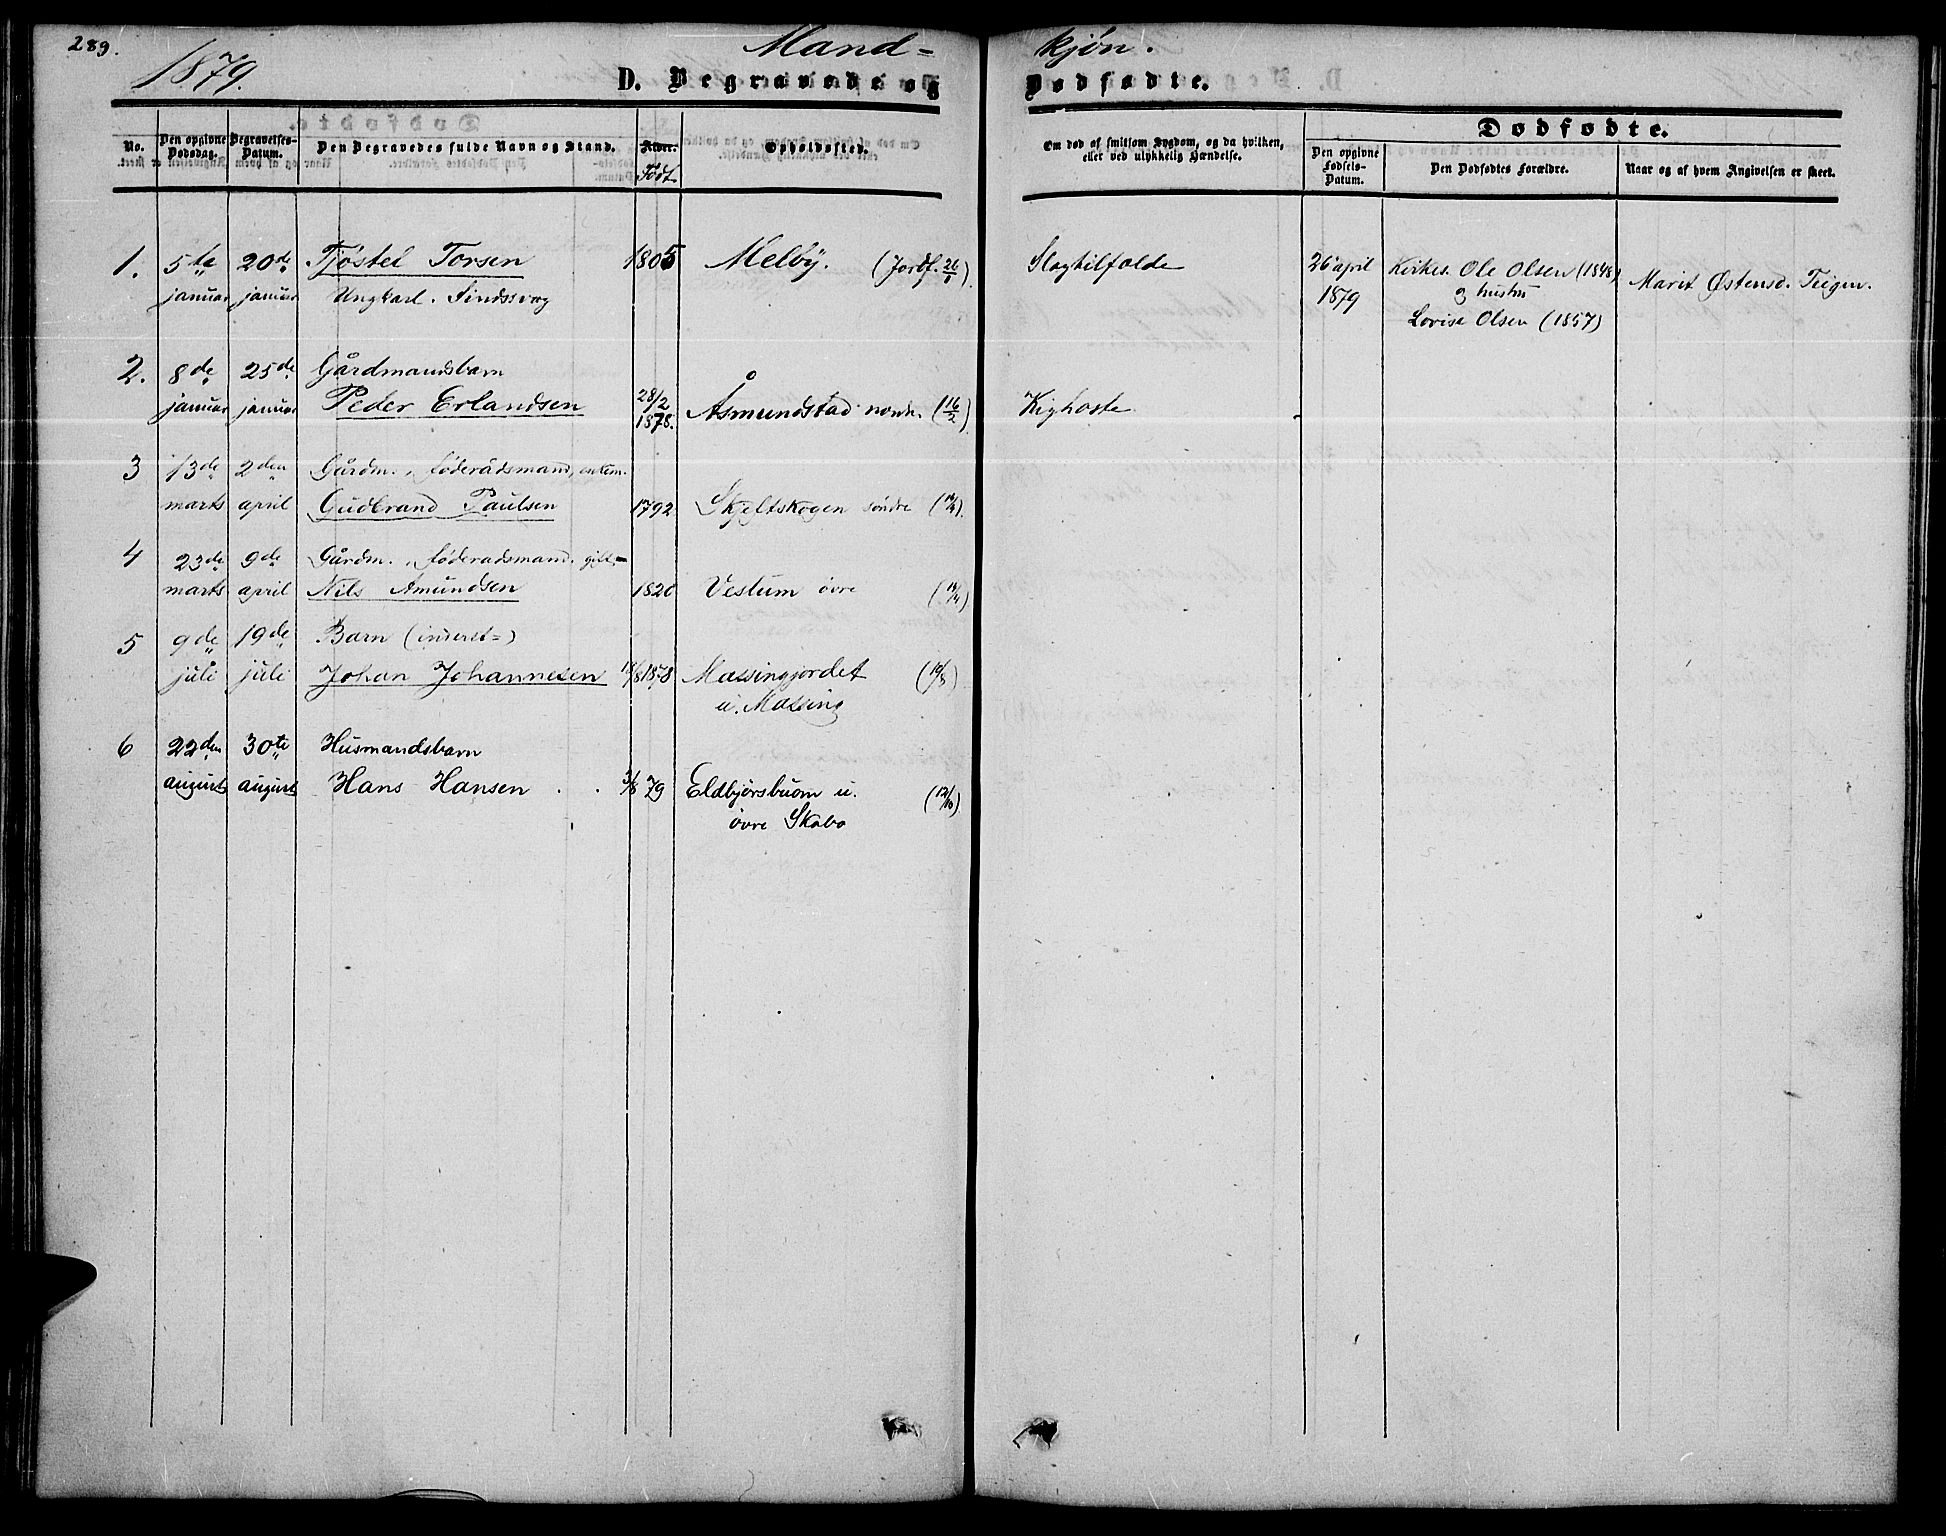 SAH, Nord-Fron prestekontor, Klokkerbok nr. 2, 1851-1883, s. 289